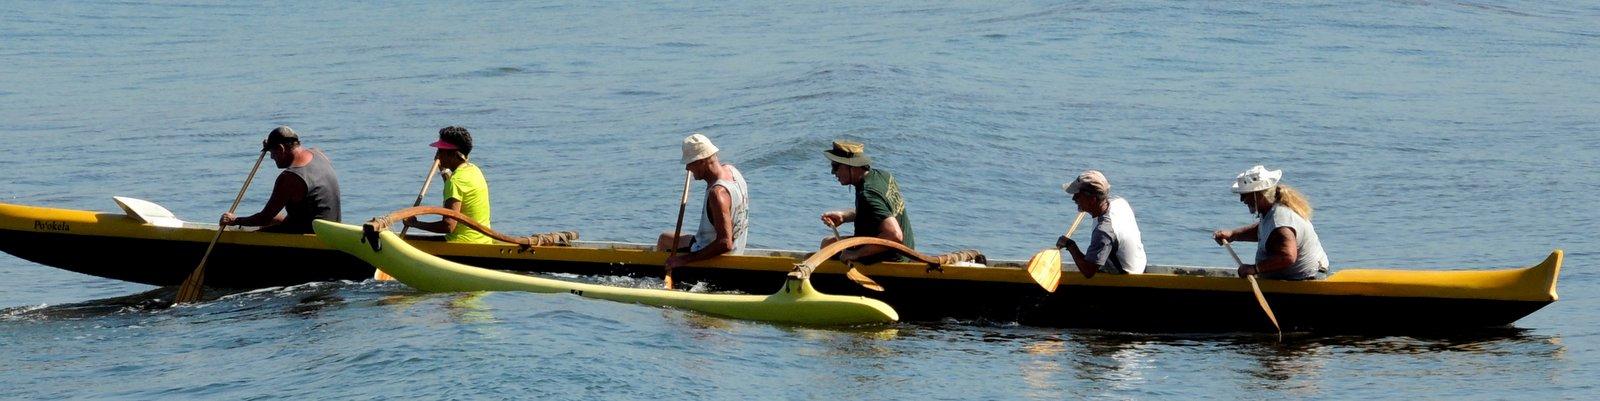 Outrigger Boot - Maui